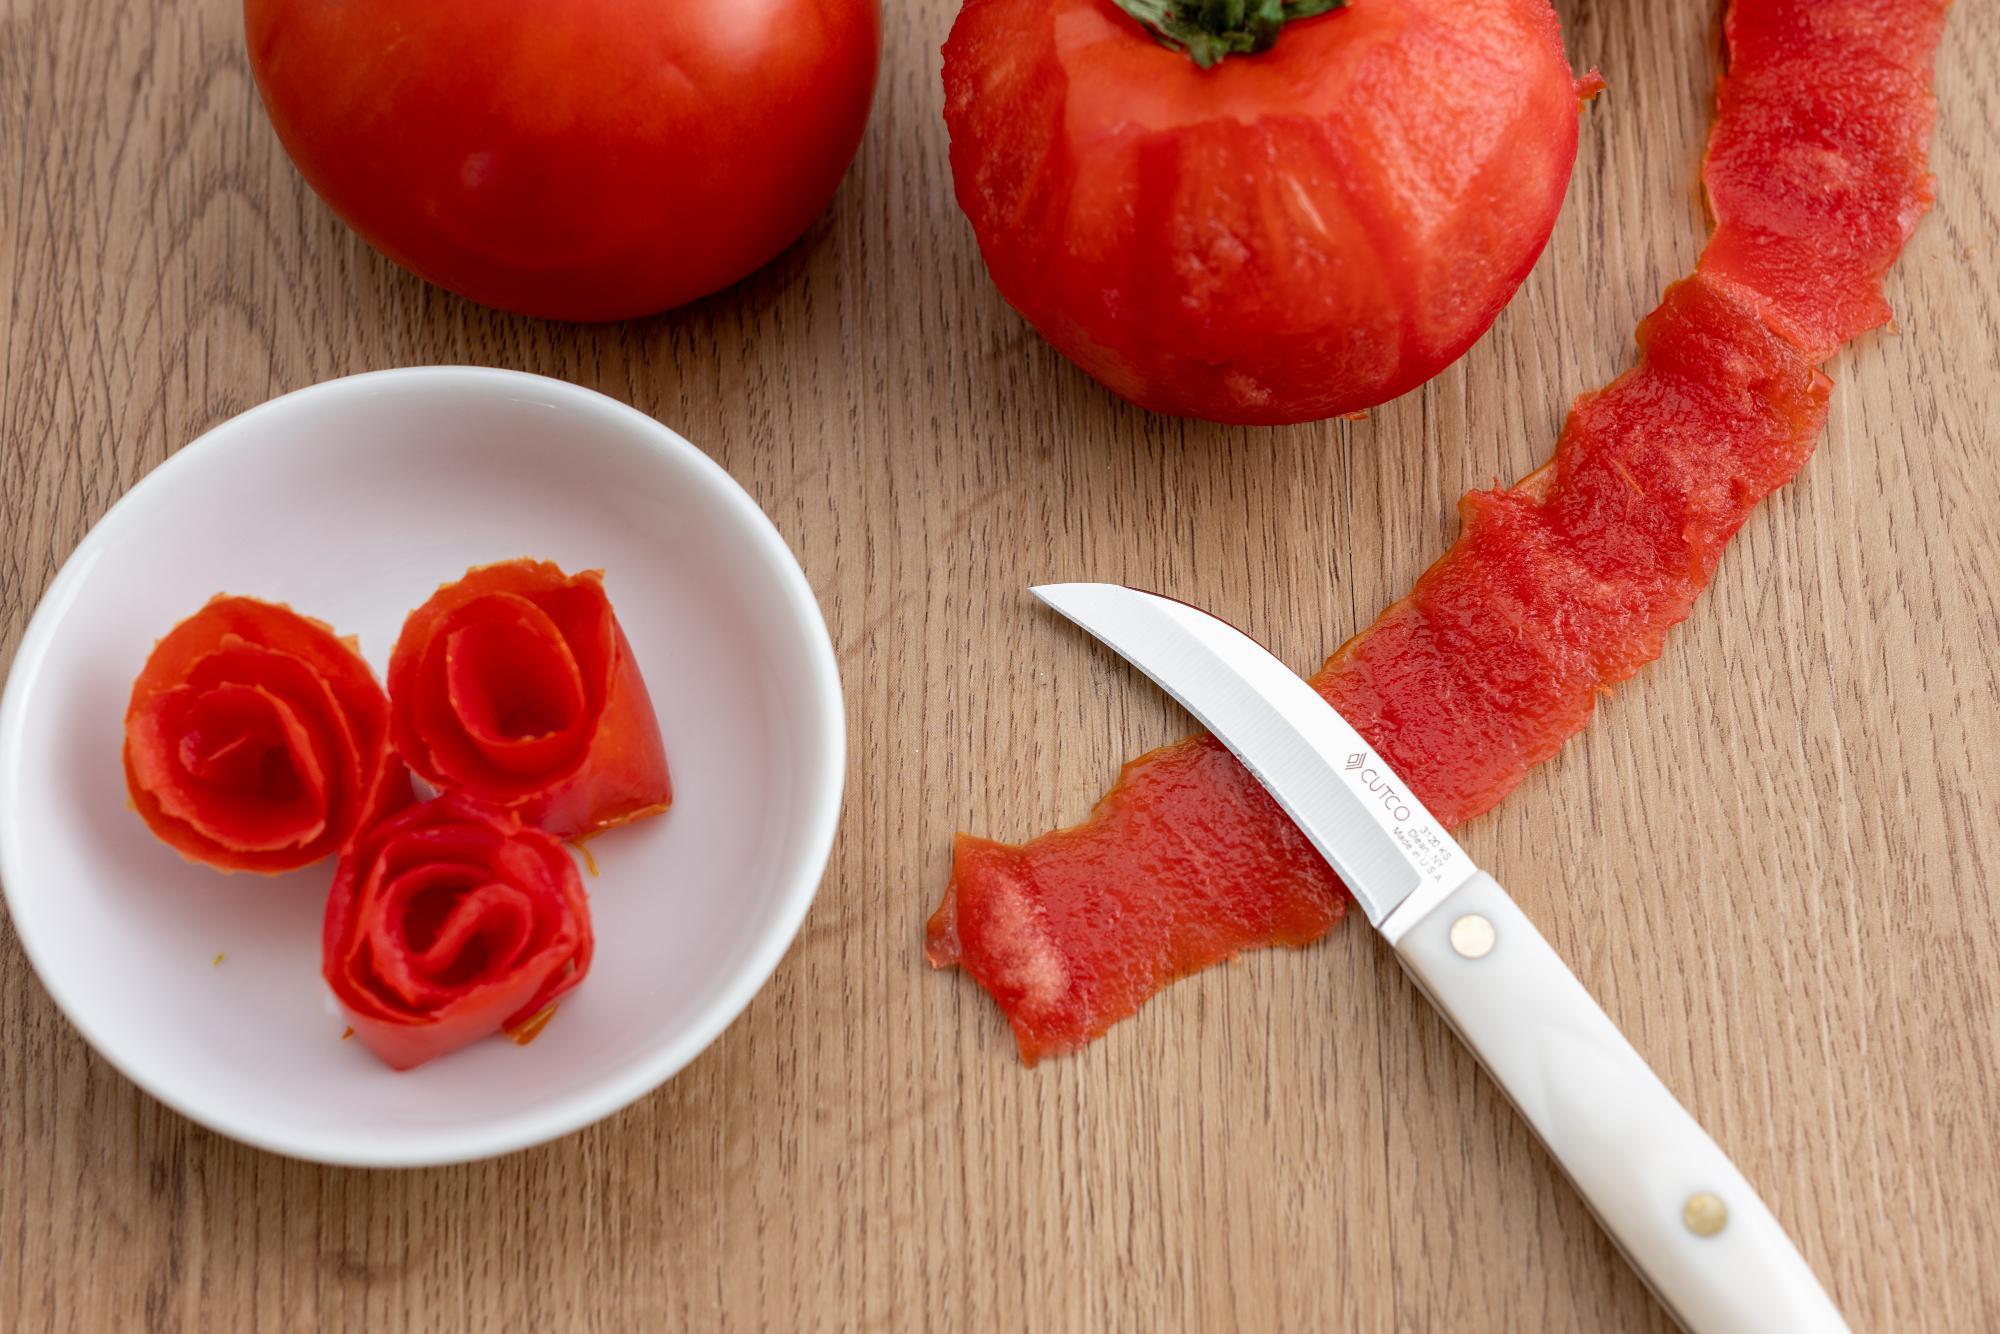 Tomato rose garnish.